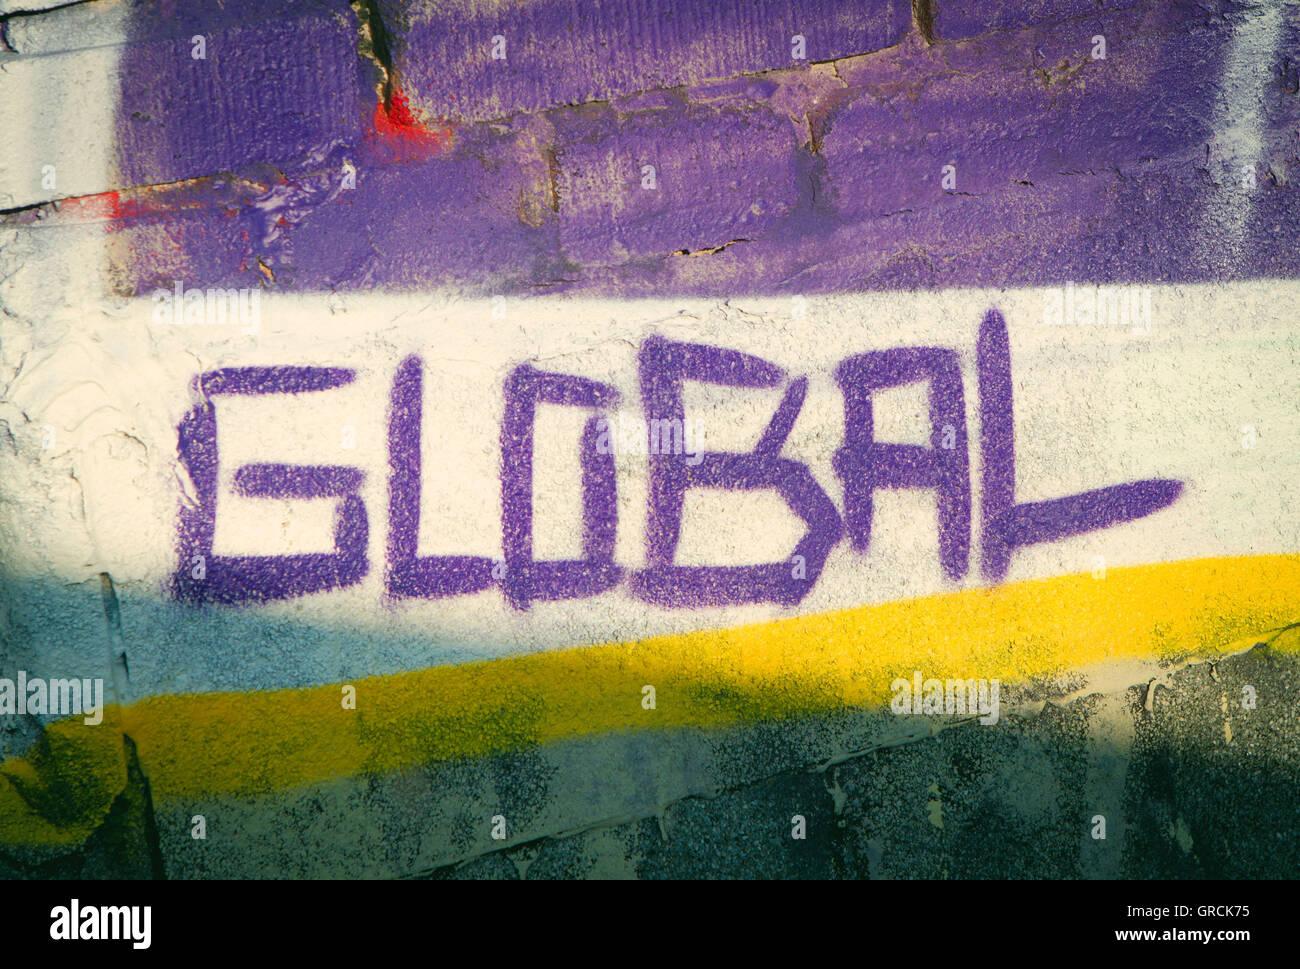 Global, Graffiti, Youth Culture - Stock Image